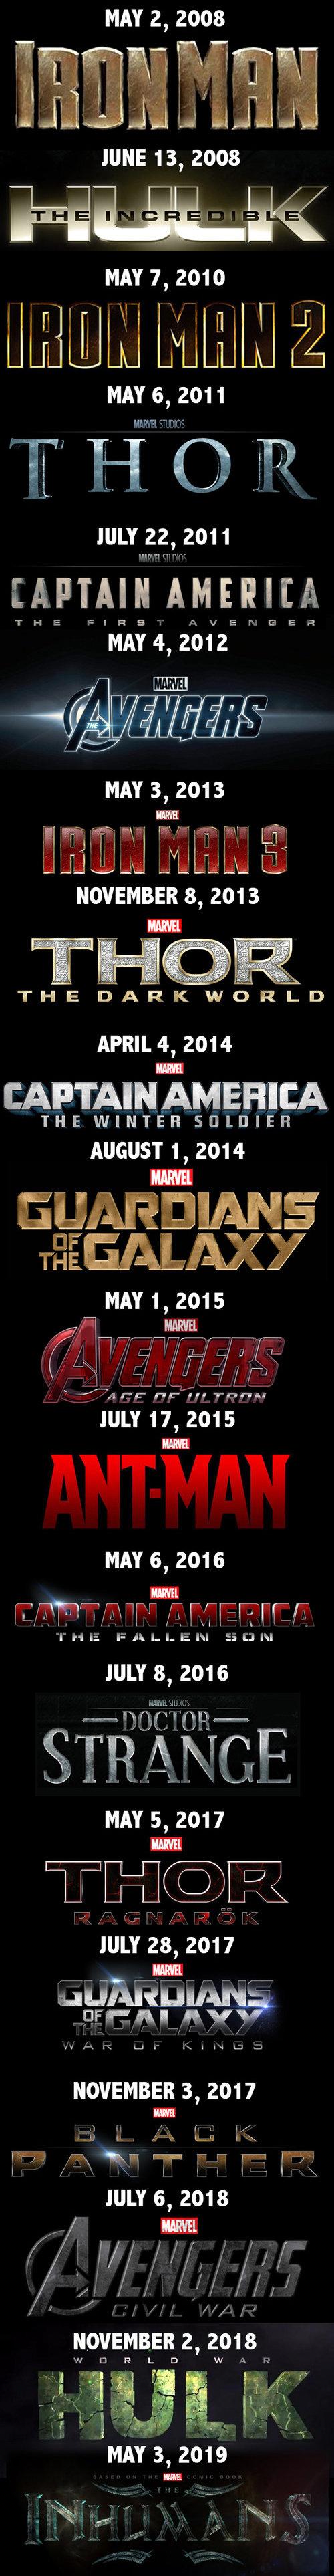 I love Marvel movies. . MAY 2, 2008 JUNE 13, 2008 MAY 7, 2010 MAY 6, 2011 JULY 22, 2011 MAY 3, 2013 NOVEMBER 8, 2013 APRIL 4, 2014 THE WINTER ] LI] IEH AUGUST 1 I love Marvel movies MAY 2 2008 JUNE 13 7 2010 6 2011 JULY 22 3 2013 NOVEMBER 8 APRIL 4 2014 THE WINTER ] LI] IEH AUGUST 1